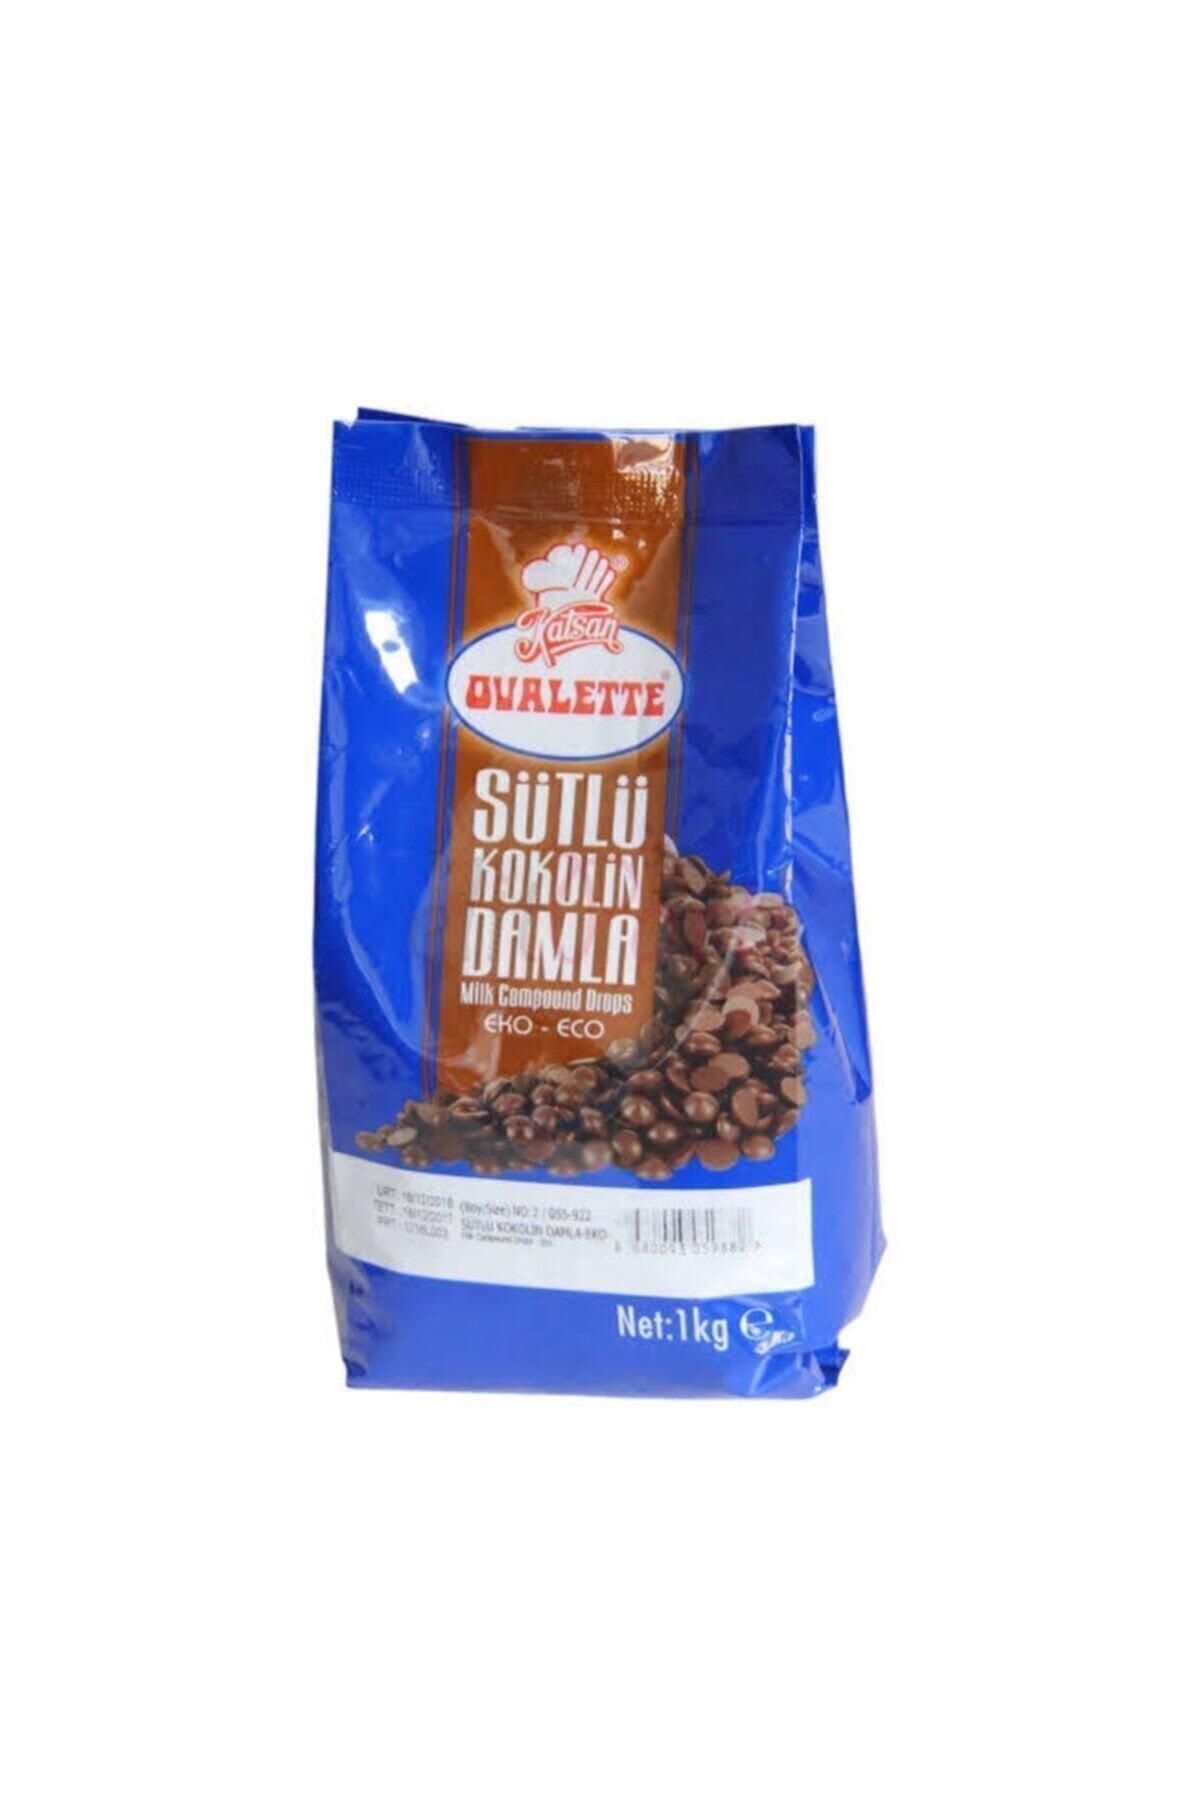 ovalette Sütlü Kokolin Damla Çikolata 1 kg 1